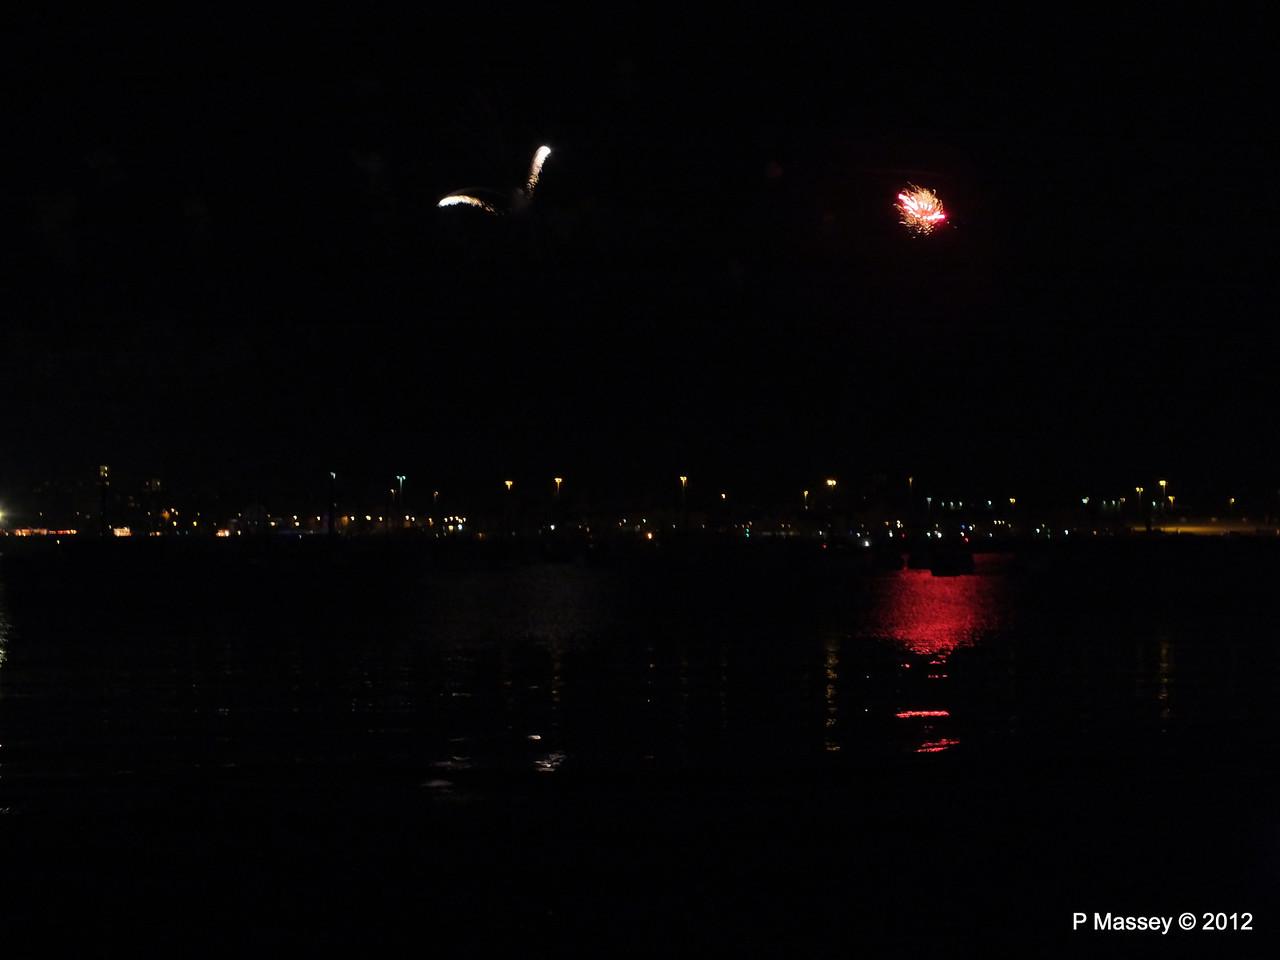 Fireworks off Mayflower Park PDM 03-11-2012 20-49-27